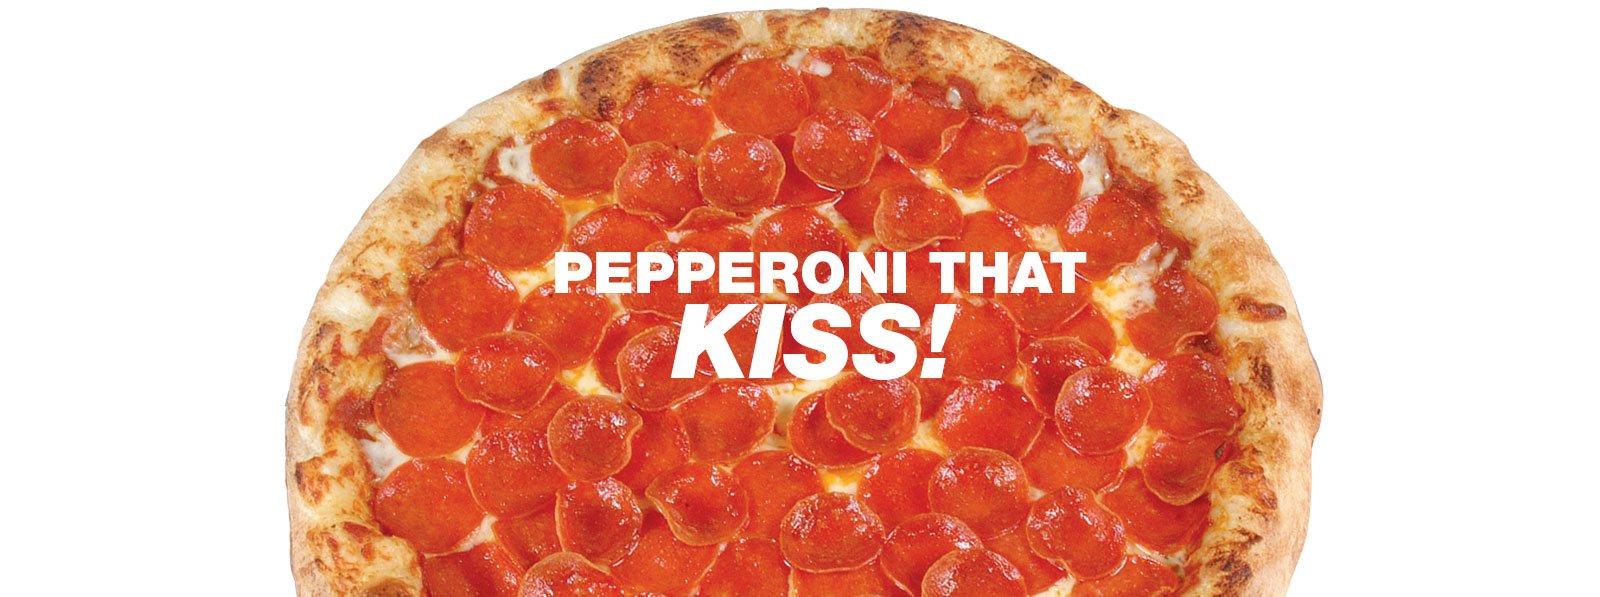 Salvatore's Old Fashioned Pizzeria image 4